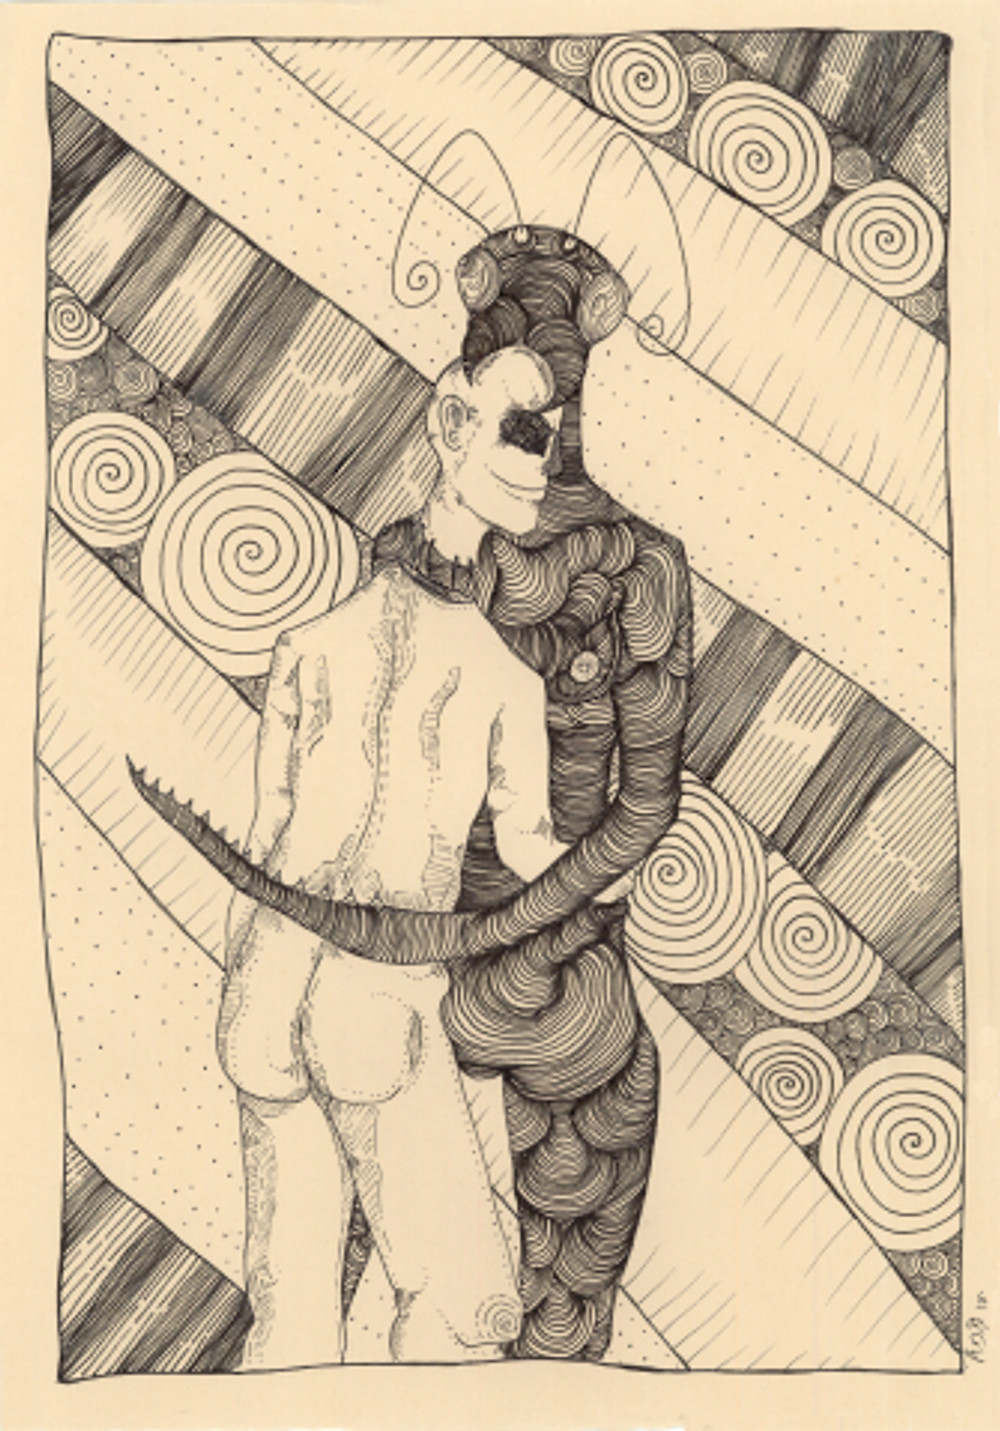 split no3, 42x29.7 cm, inking pen on paper, 2017